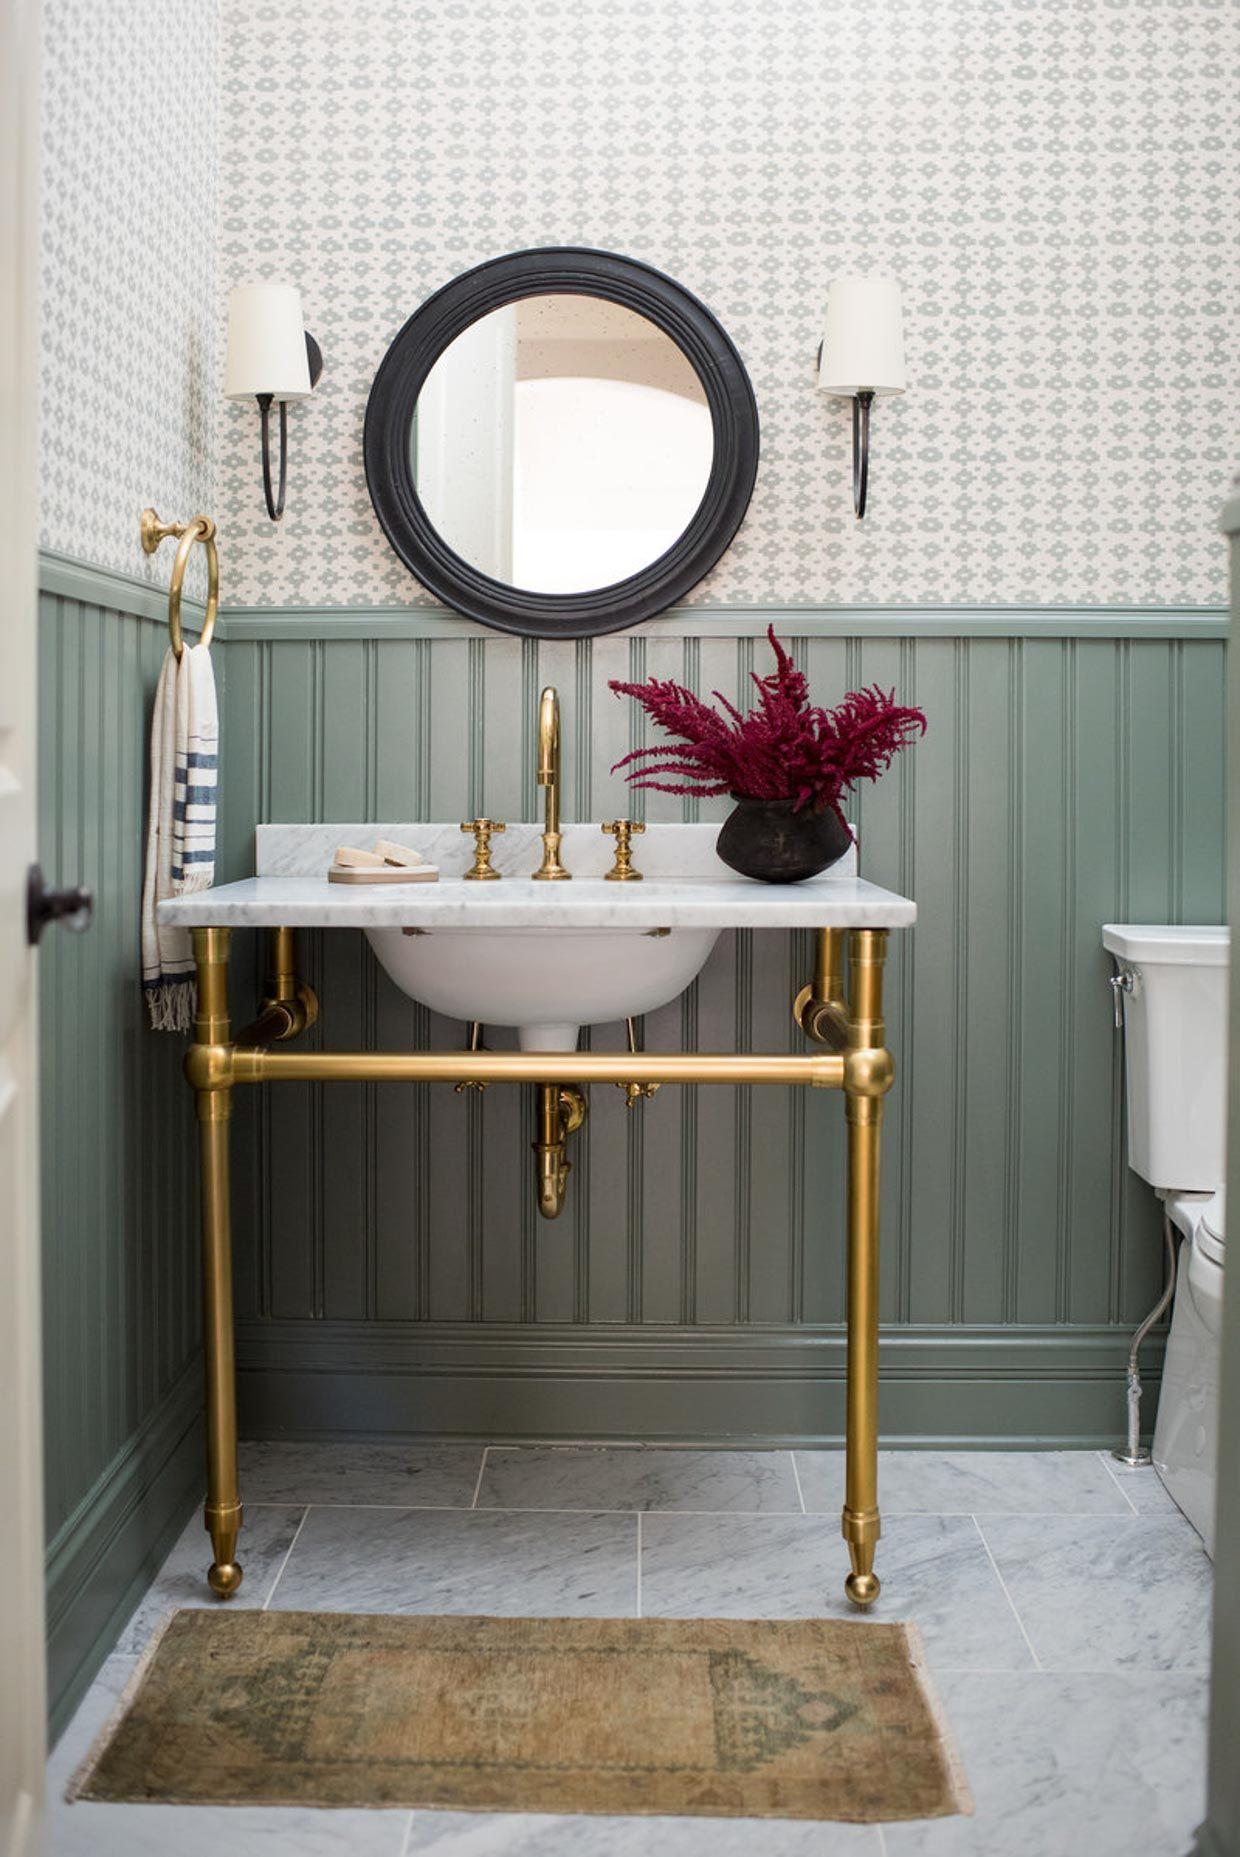 Small Bathroom Wallpaper Ideas Poor Little It Girl In 2020 Small Bathroom Wallpaper Bathroom Wallpaper Bathroom Inspiration